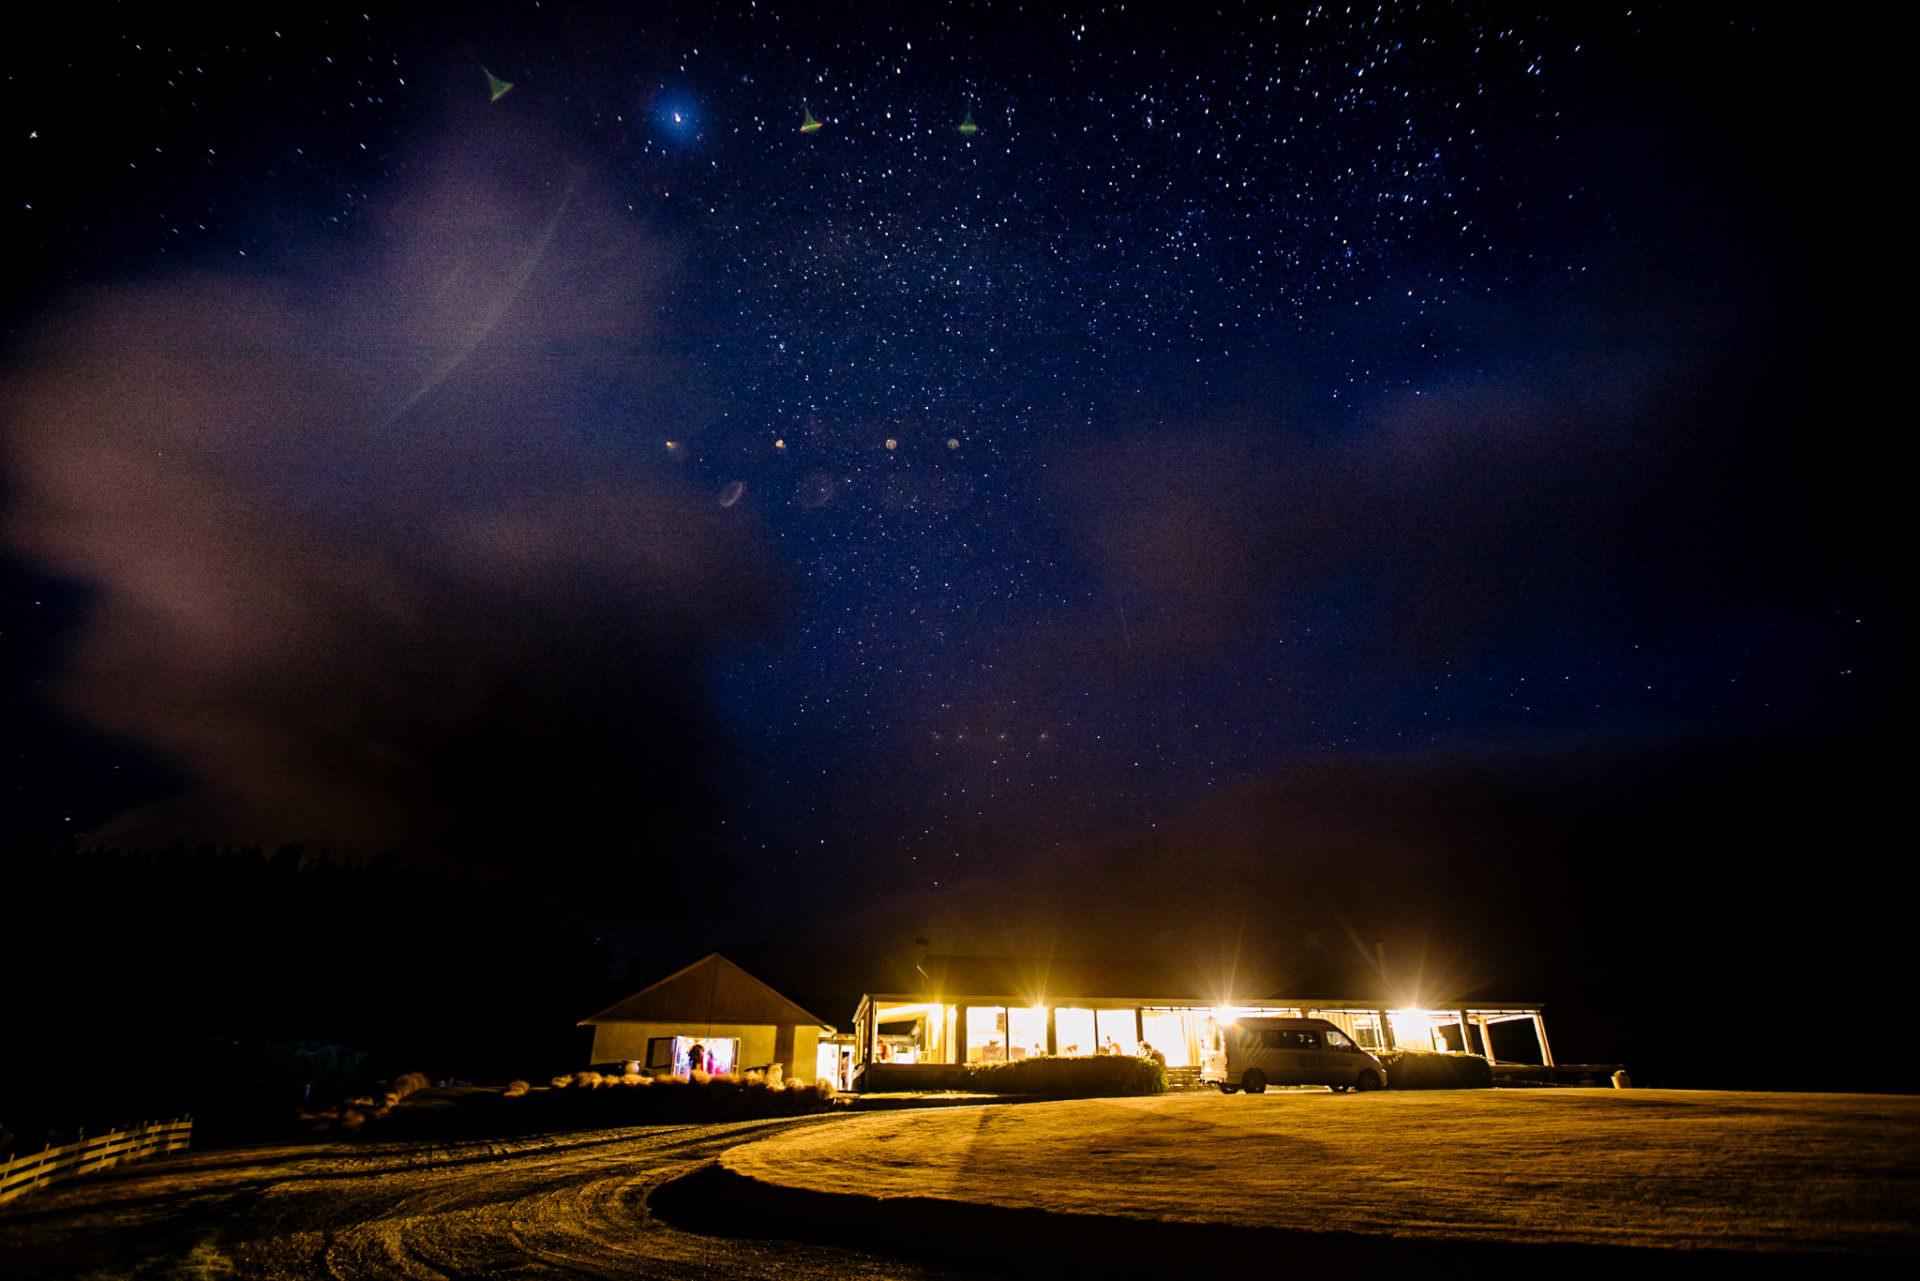 Pencarrow Lodge with stars at night